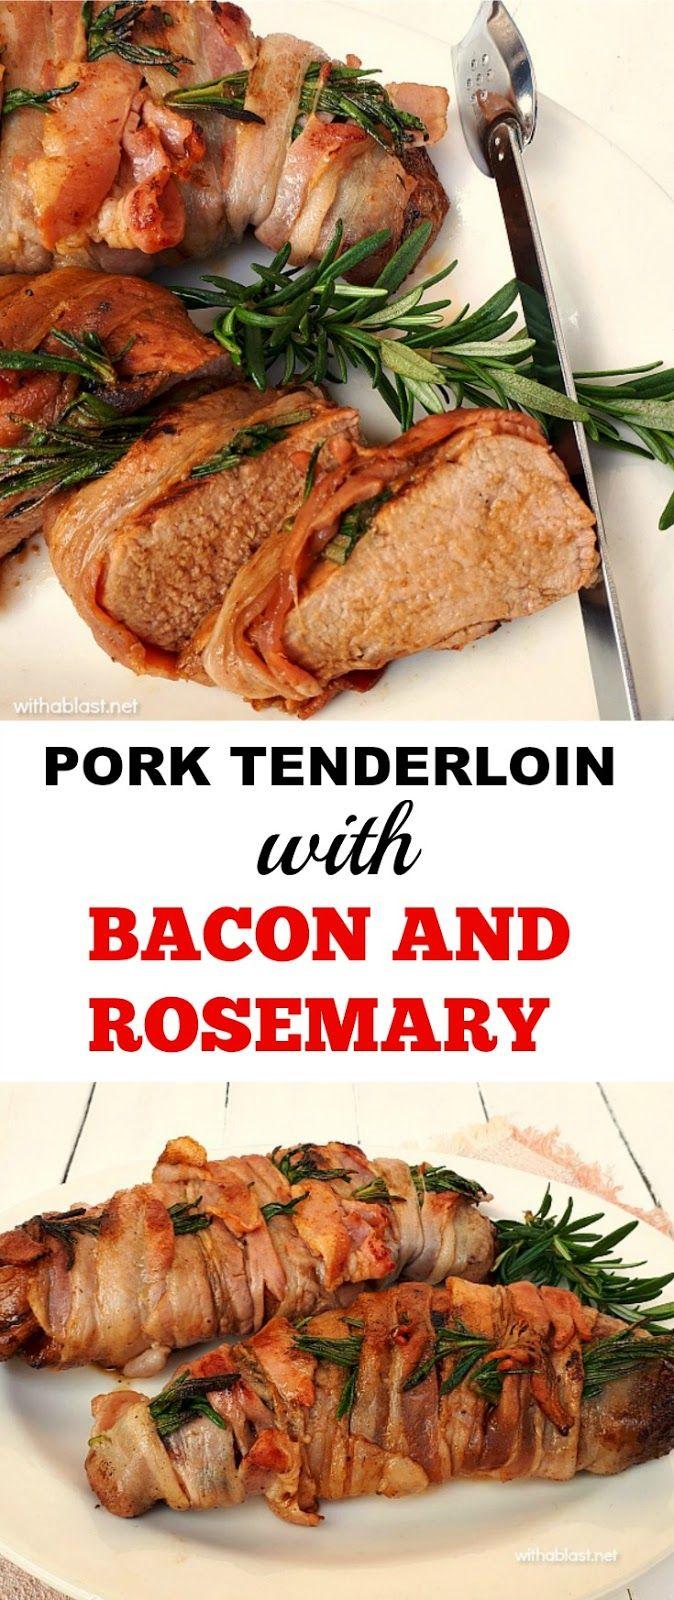 about Marinated pork tenderloins on Pinterest | Marinated pork, Pork ...